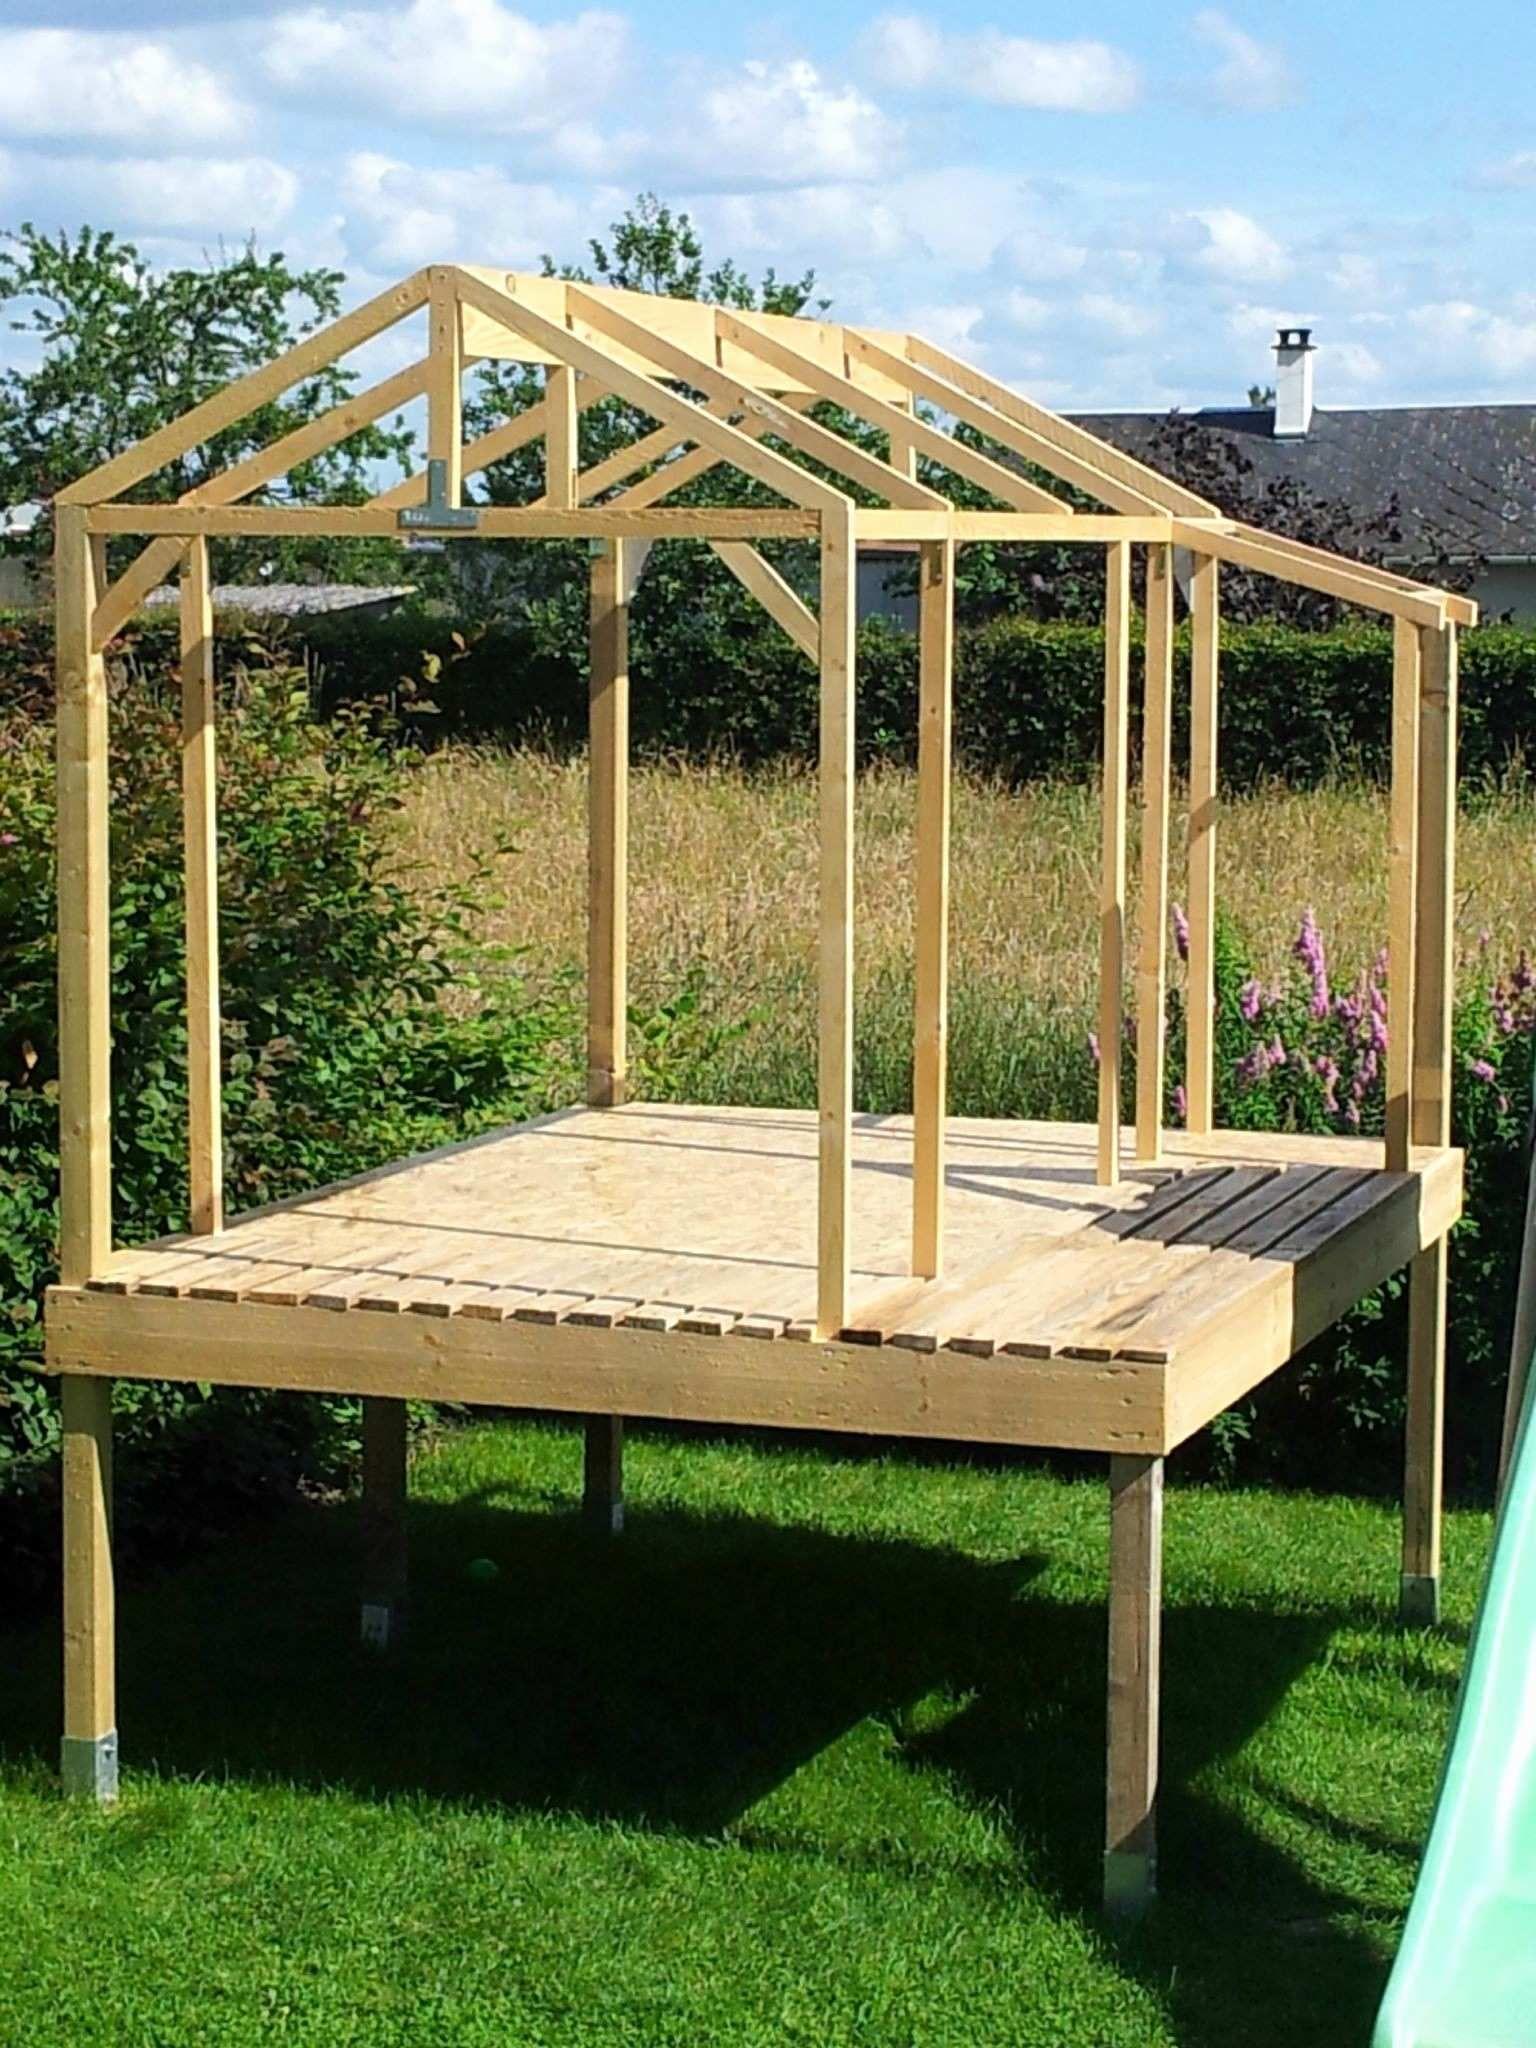 Construire Abris Bois fabriquer abri de jardin en bois construire abri | СВОИМИ